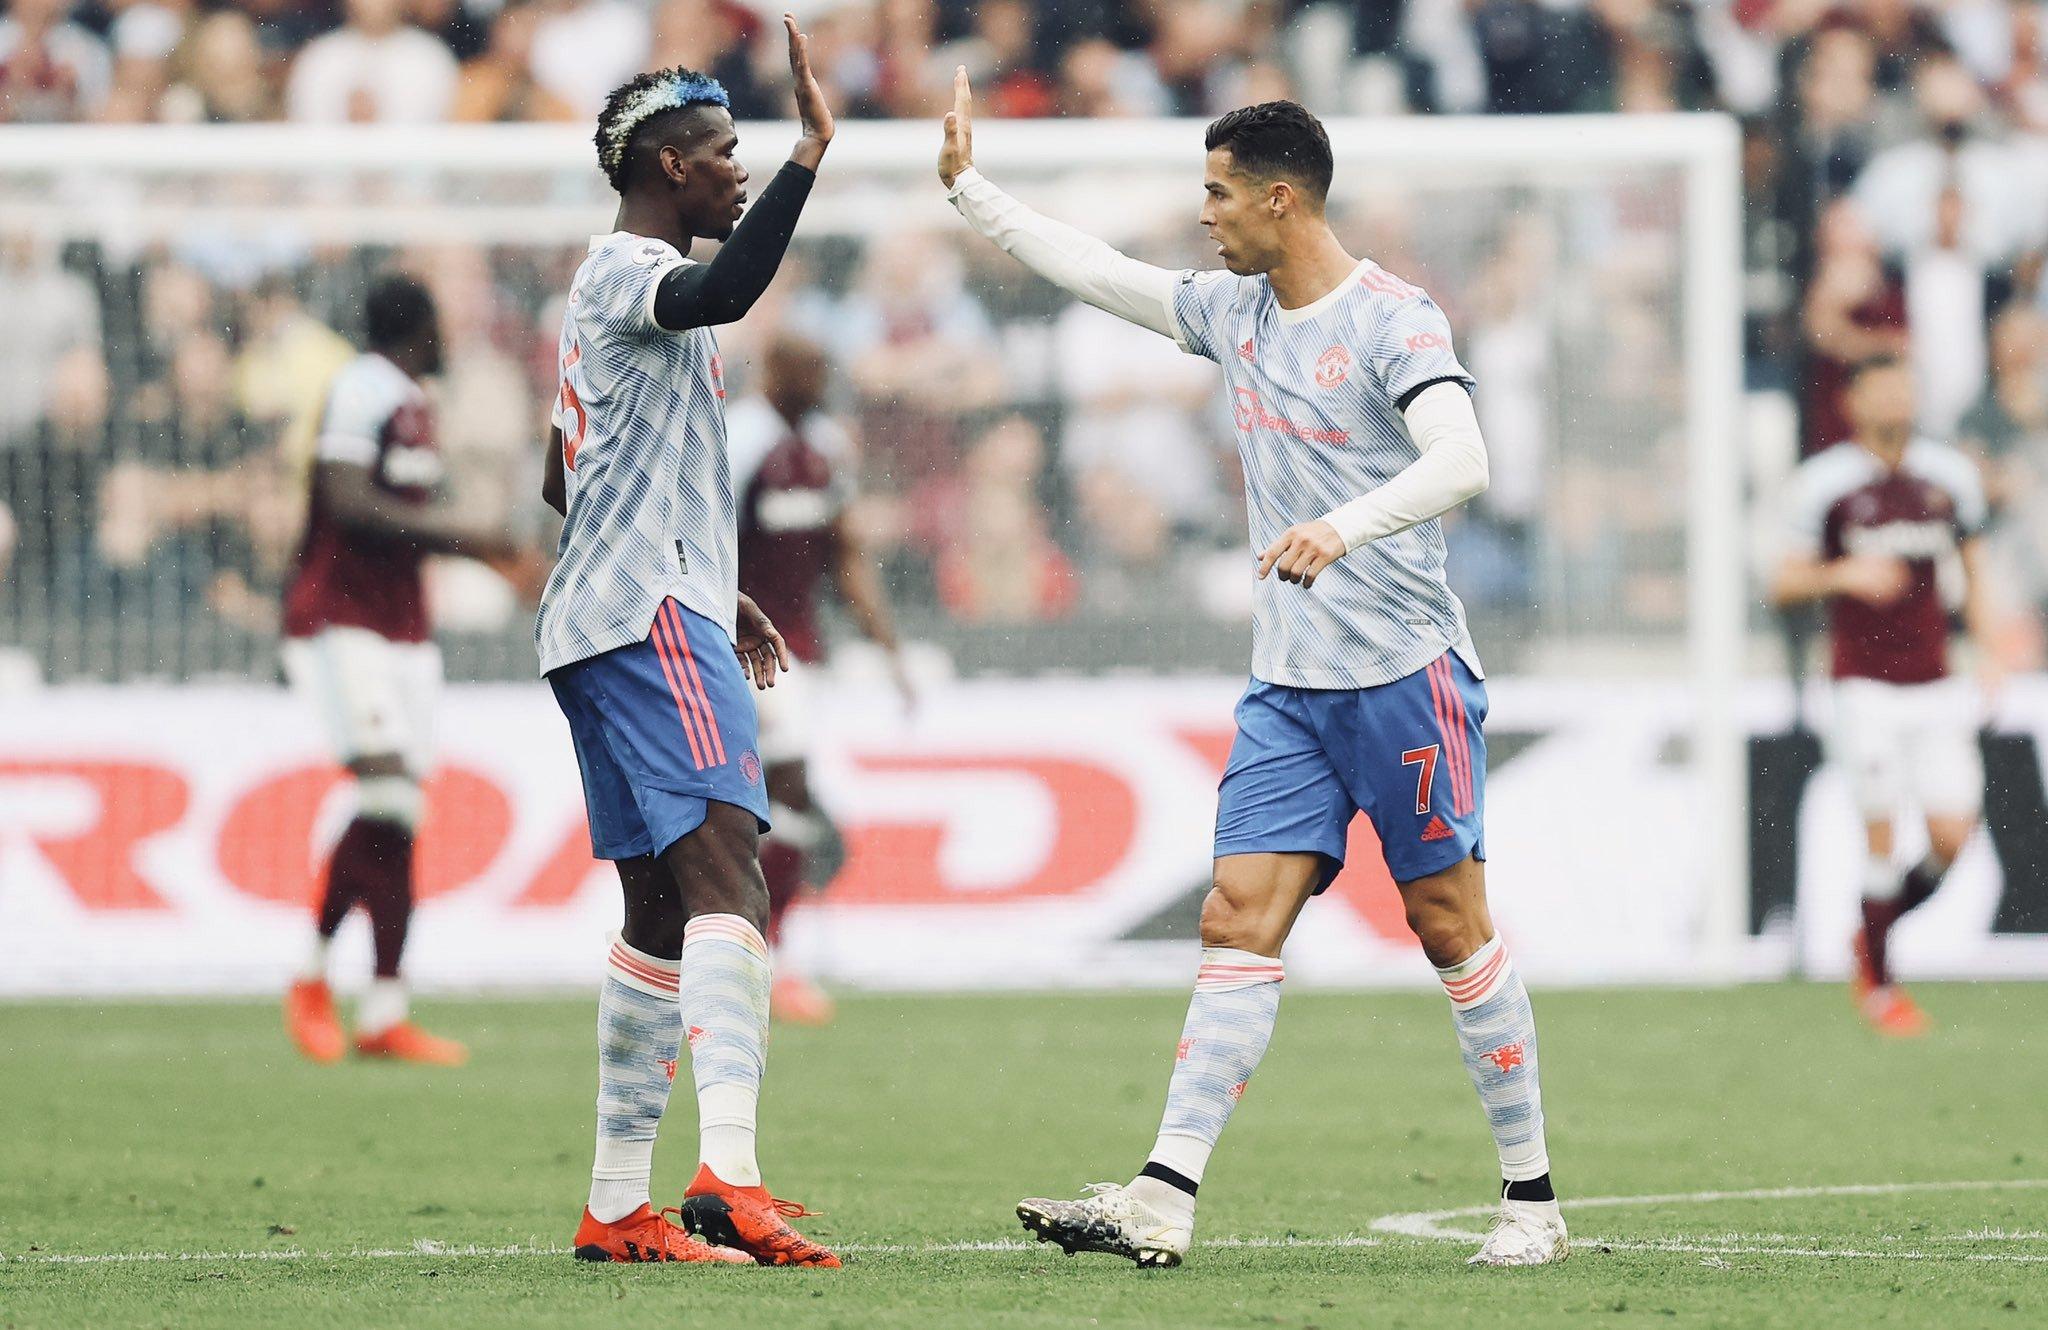 West Ham 1-2 Manchester United: Ronaldo Bikin Rekor, Lingard Tebus Kesalahan - JPNN.com